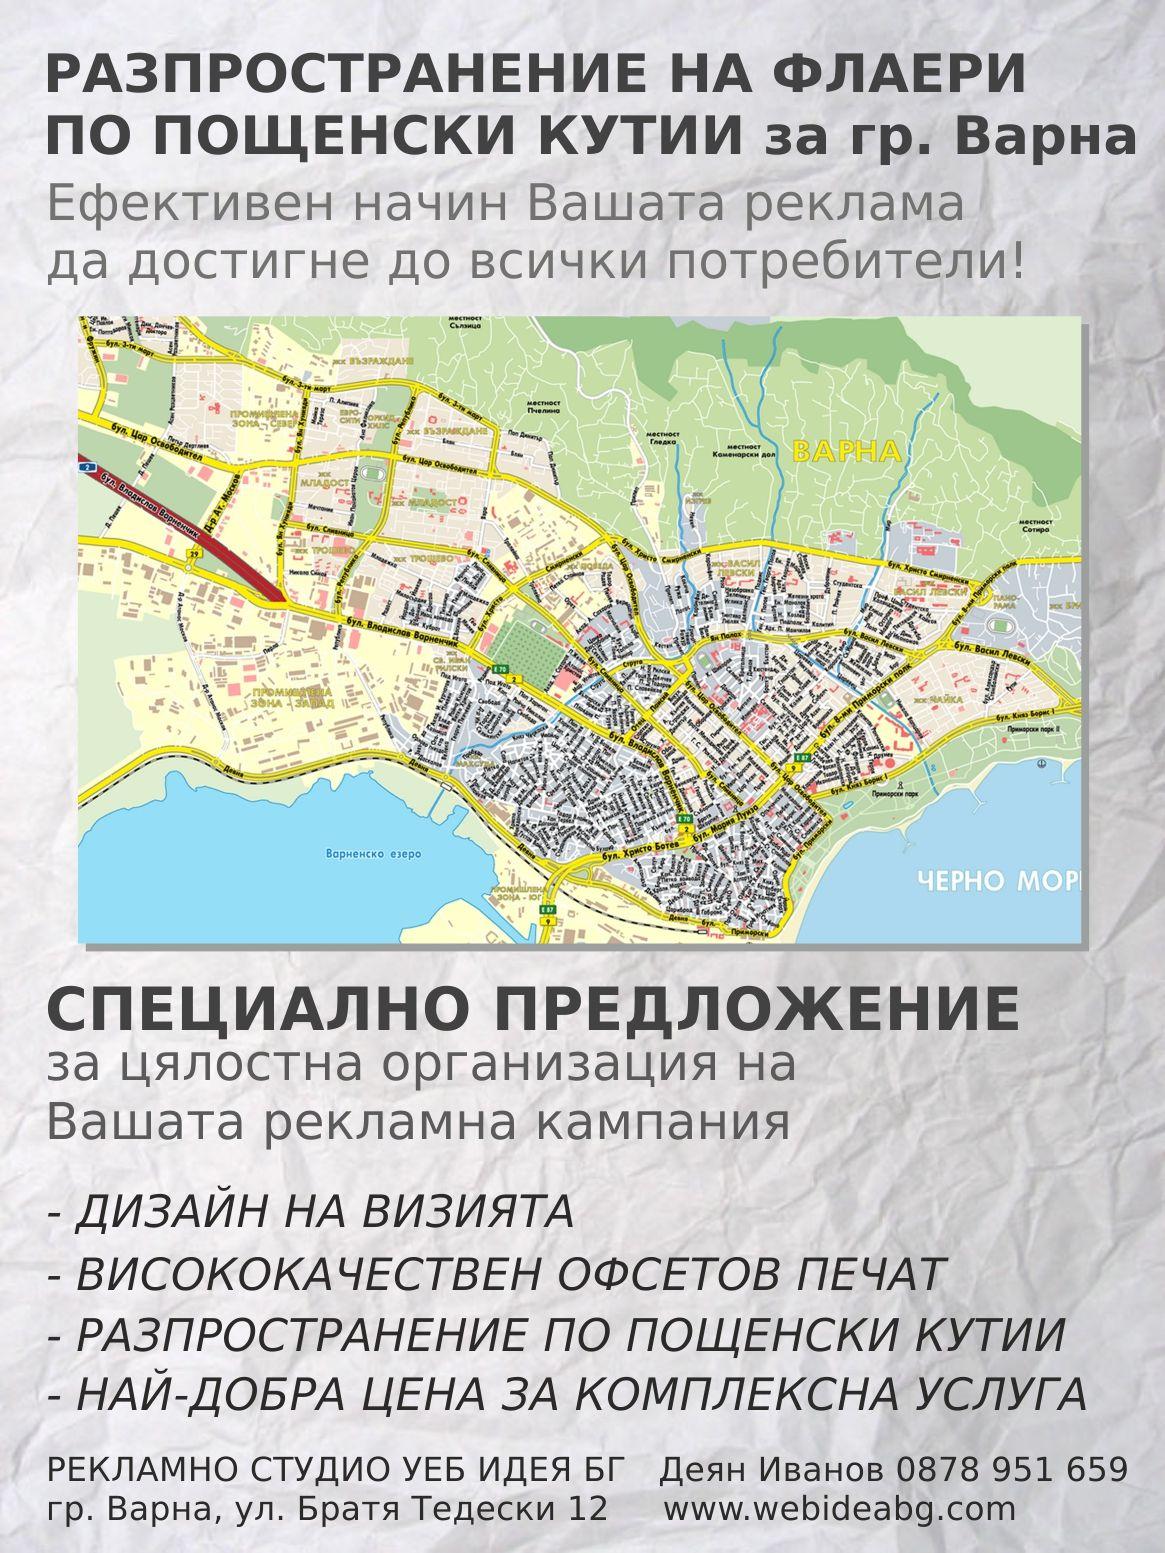 Razprostranenie Na Flaeri Za Gr Varna Places To Visit Map